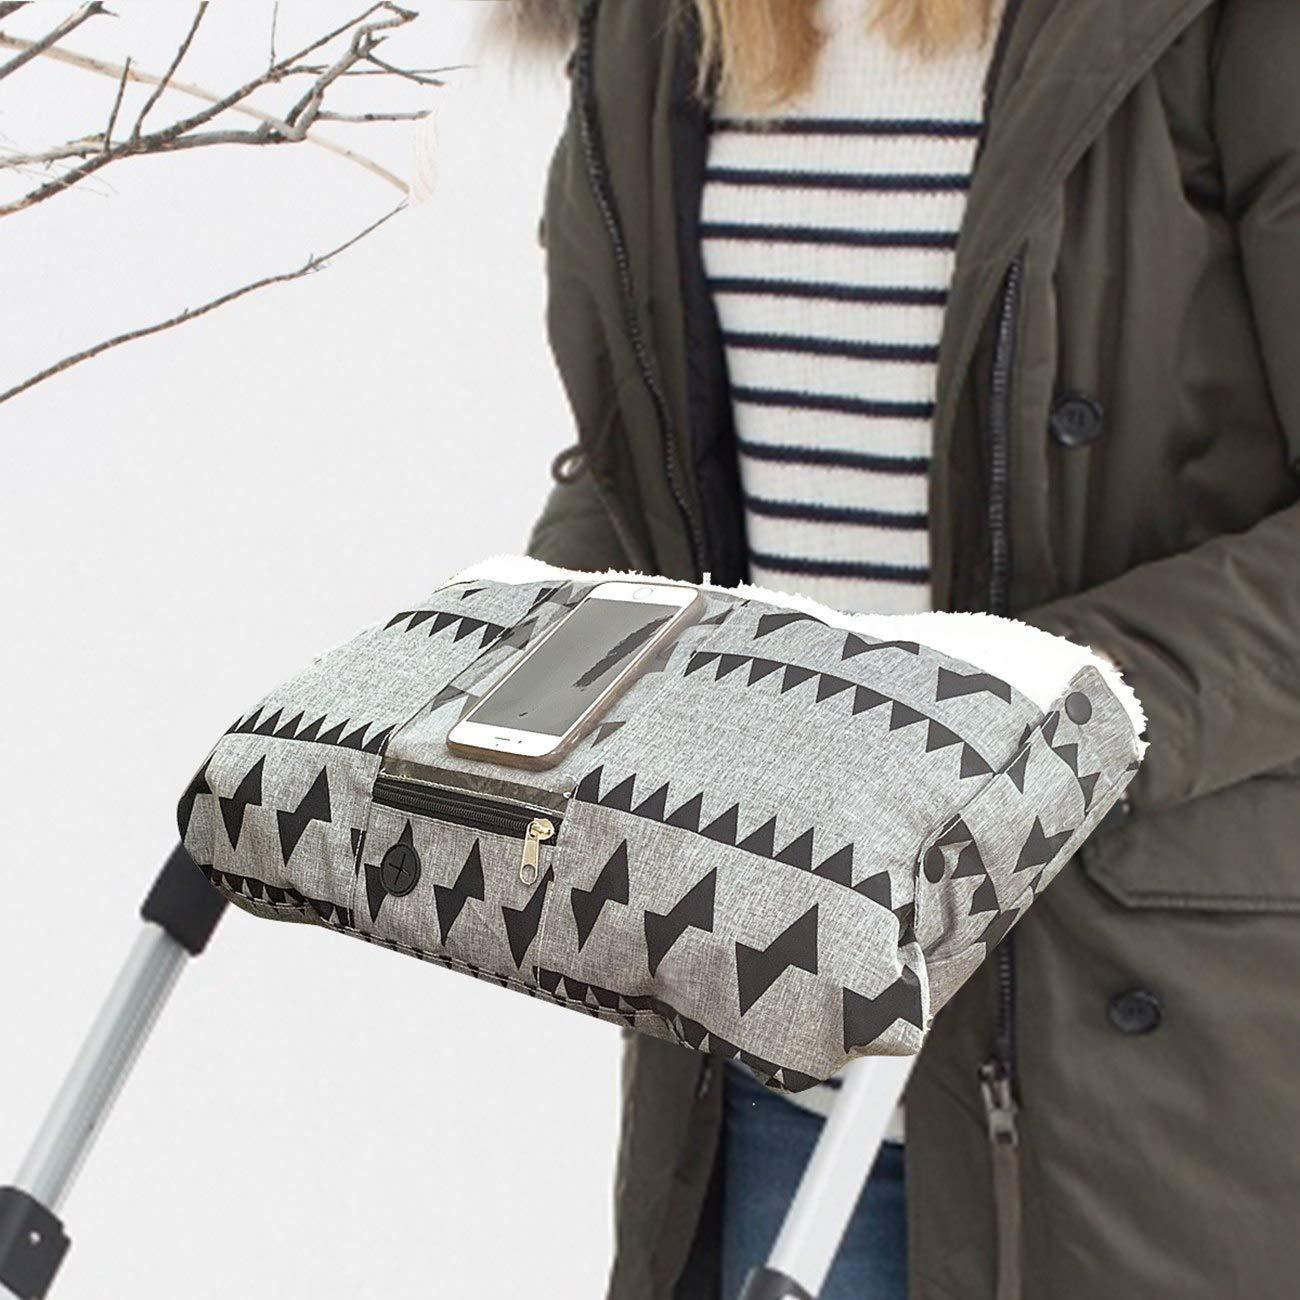 VDROL Stroller Hand Warmer, Stroller Hand Muff Stroller Fleece Hand Gloves Anti-freeze Baby Stroller Accessories,Warmer for Most Baby Infant Toddler Single Handle Pushchair Pram Stroller